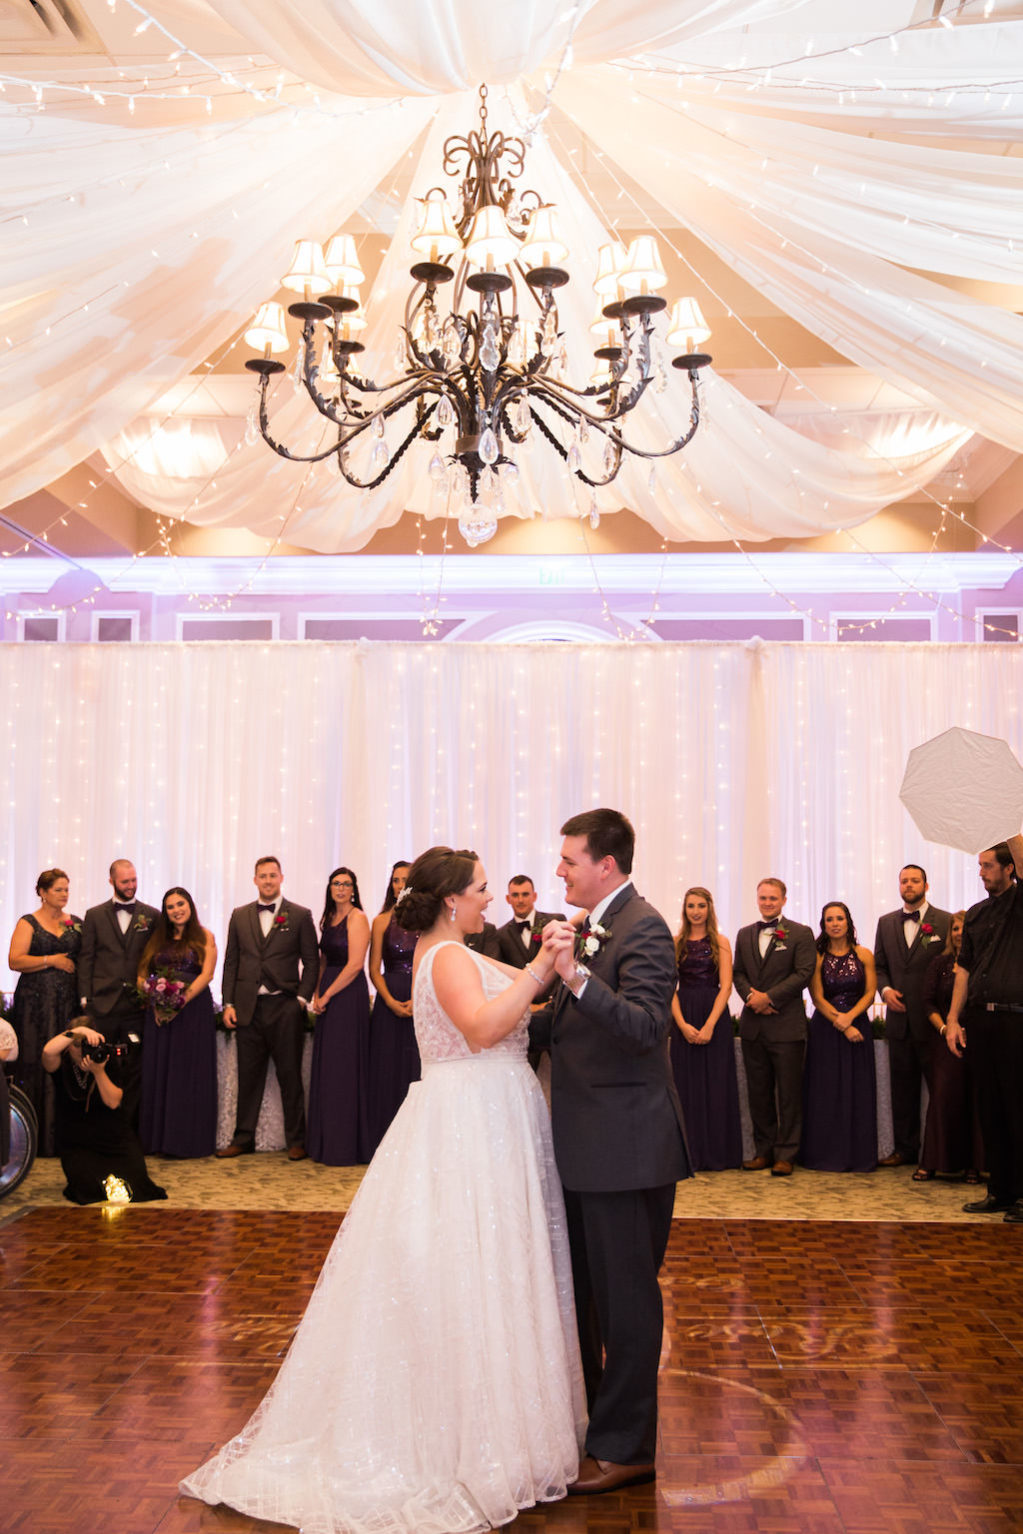 Whimsical Ballroom Wedding Reception First Dance Portrait | Sarasota Wedding DJ Grant Hemond and Associates